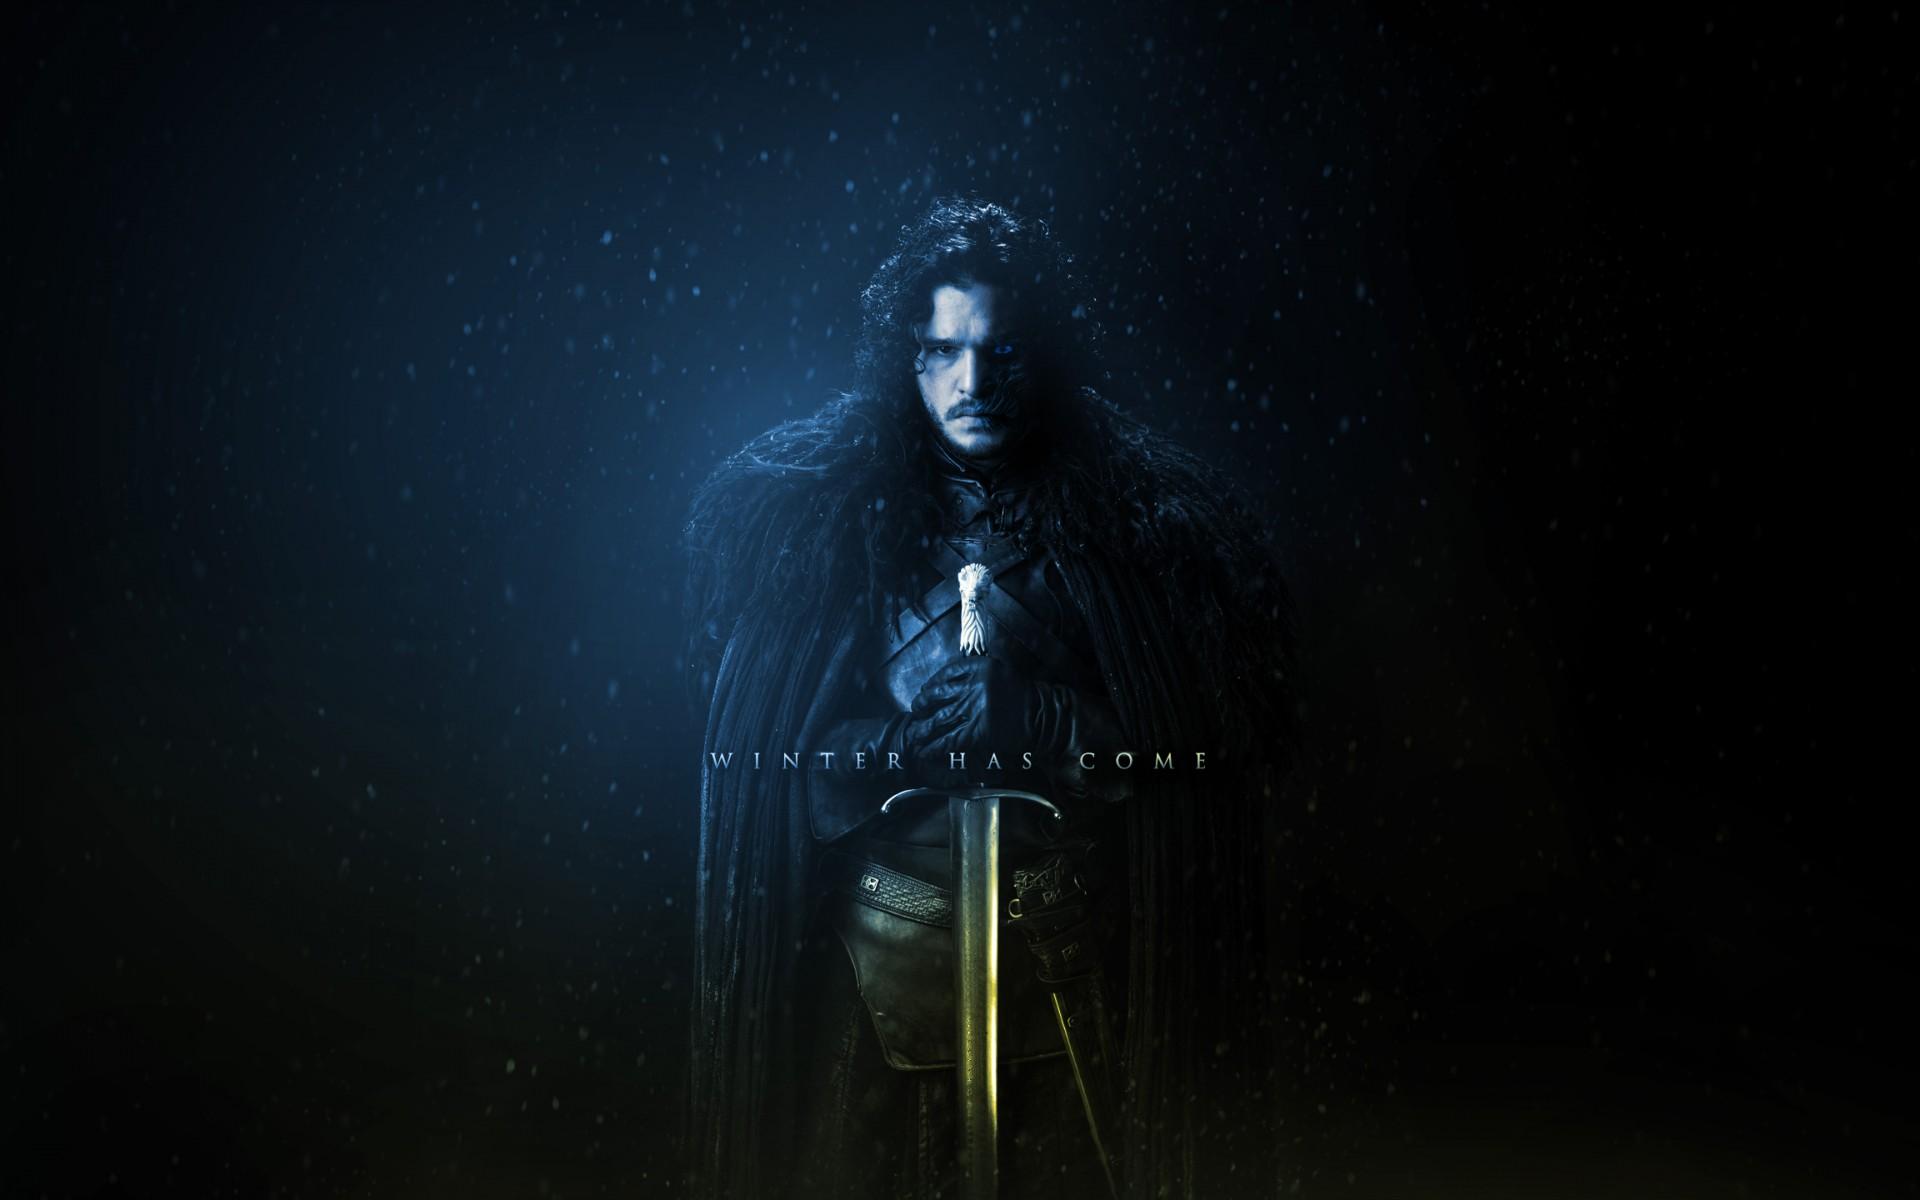 Download-high-quality-Game-of-Thrones-Season-Jon-Snow-Kit-Harington-Winter-has-come-HD-wallpaper-wp3404865